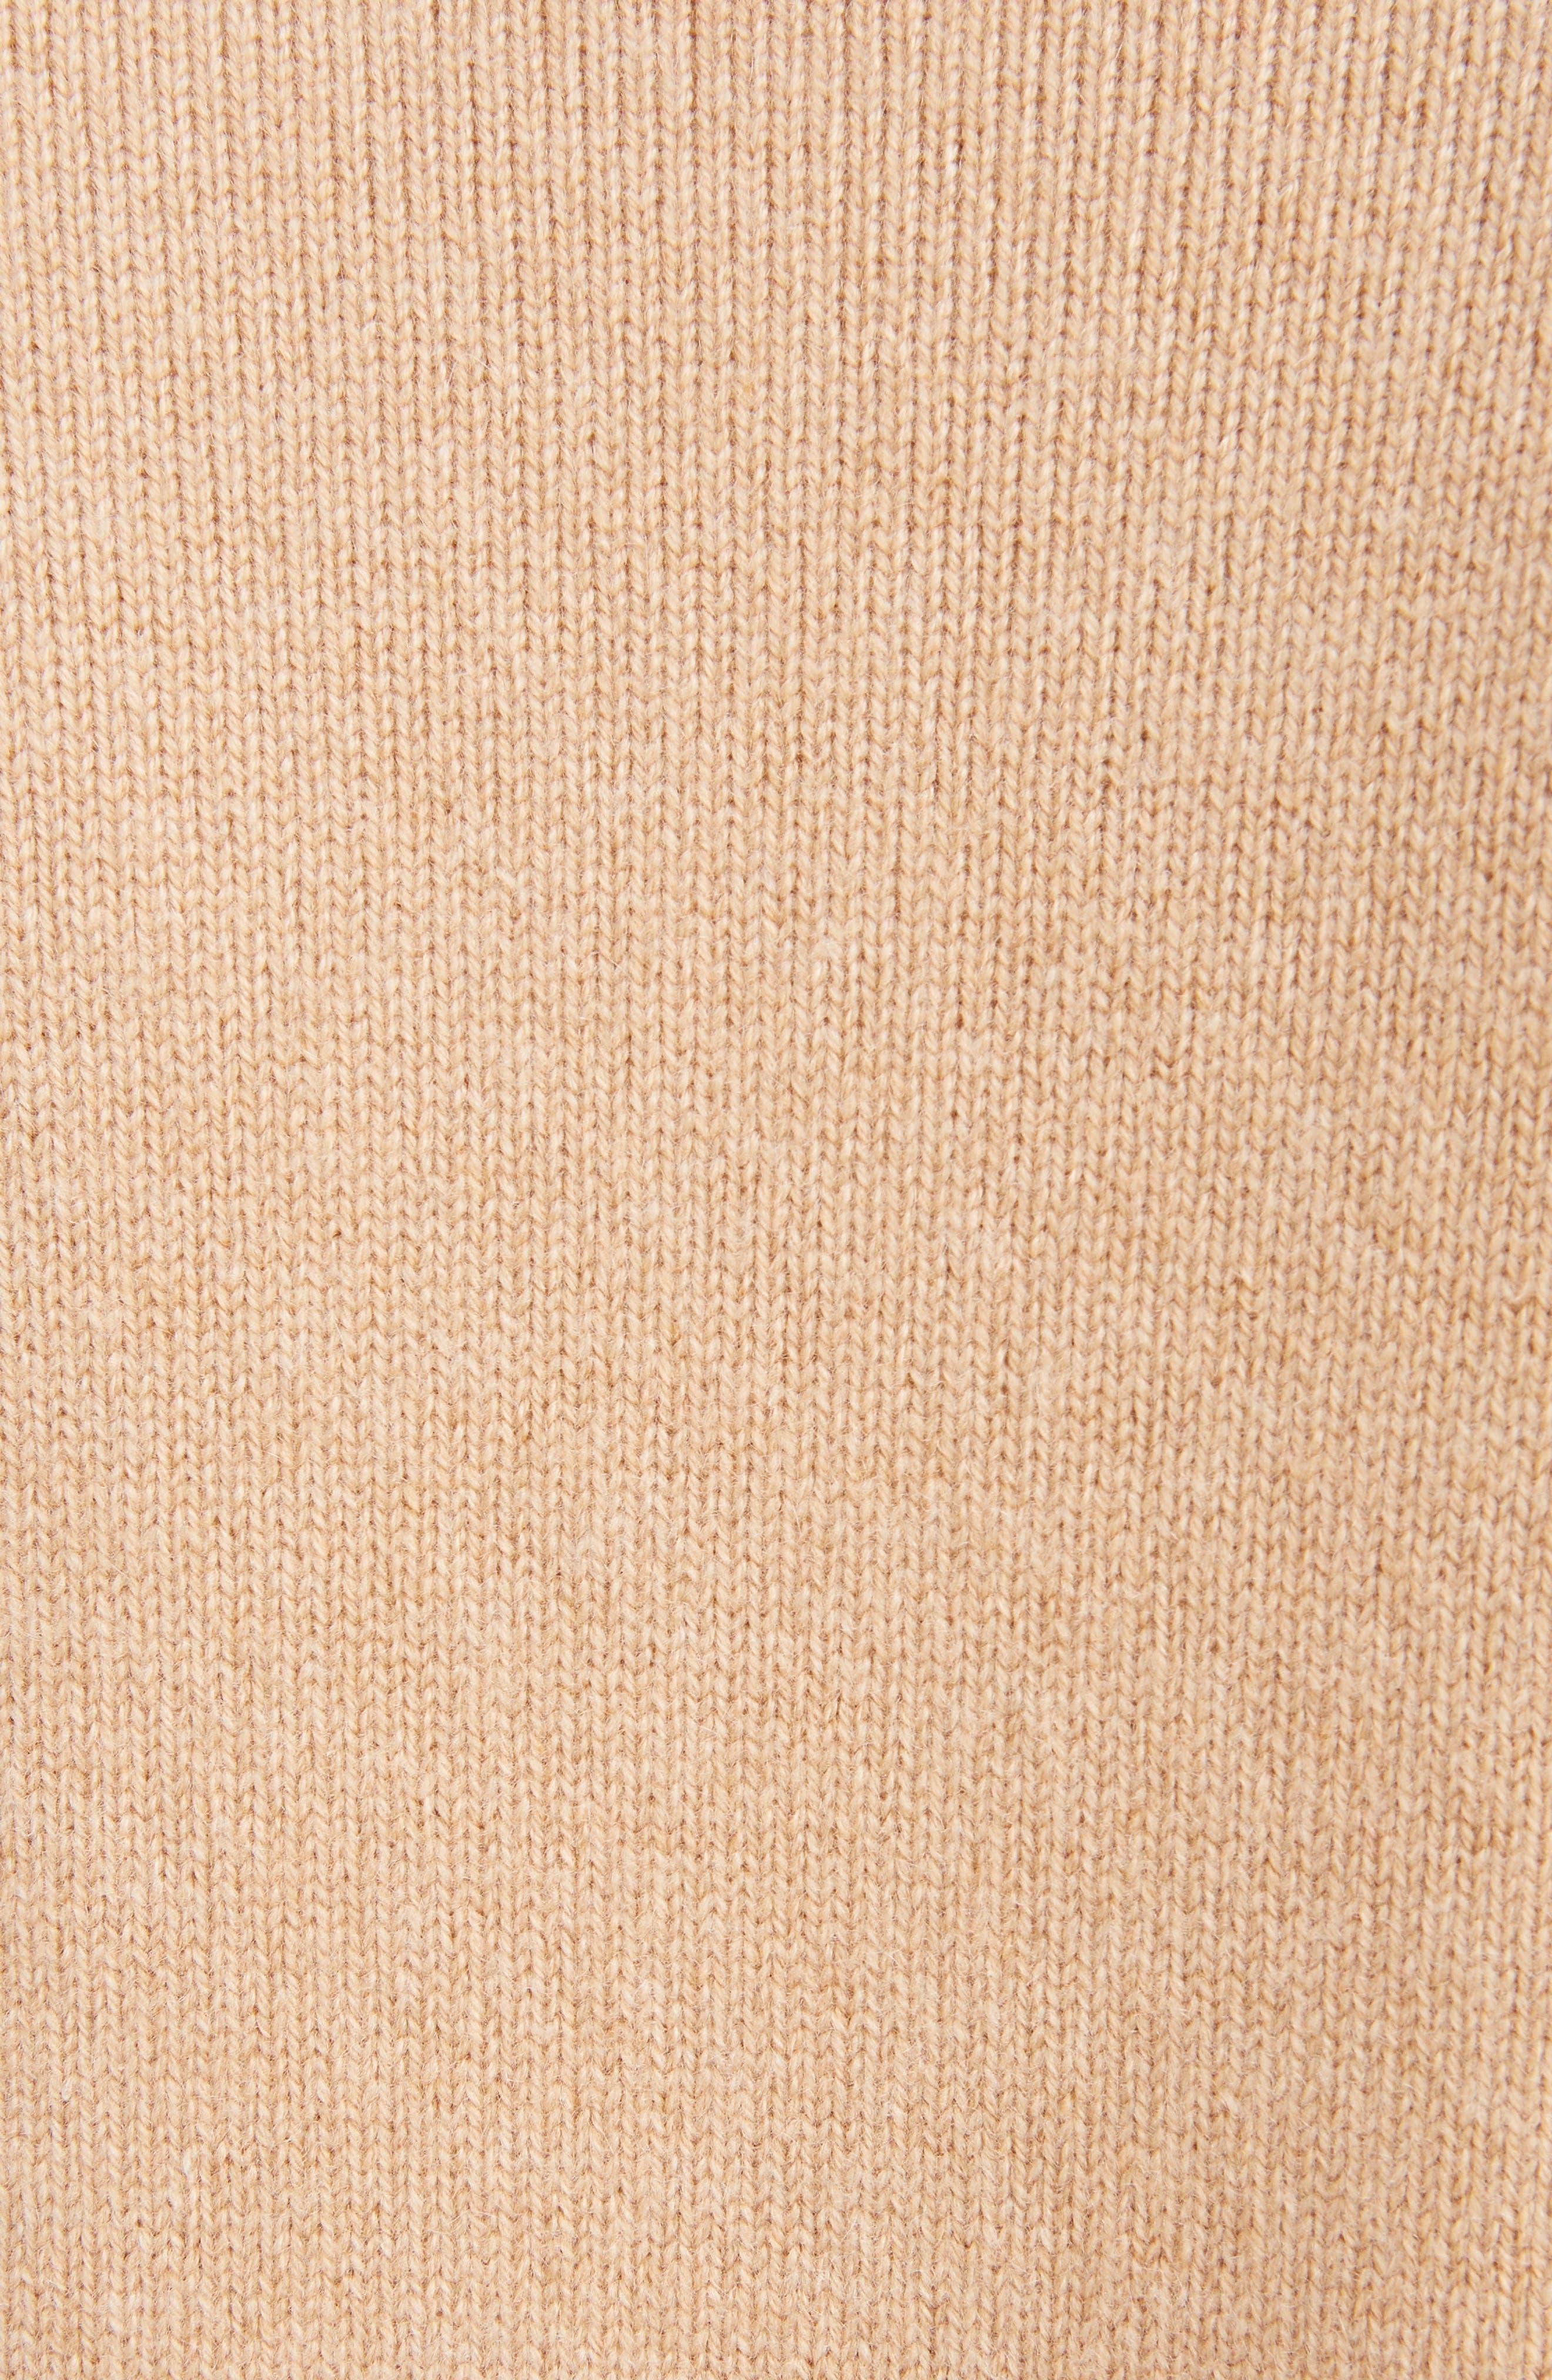 VICTORIA BECKHAM, Cashmere Blend Sweater, Alternate thumbnail 5, color, LIGHT CAMEL